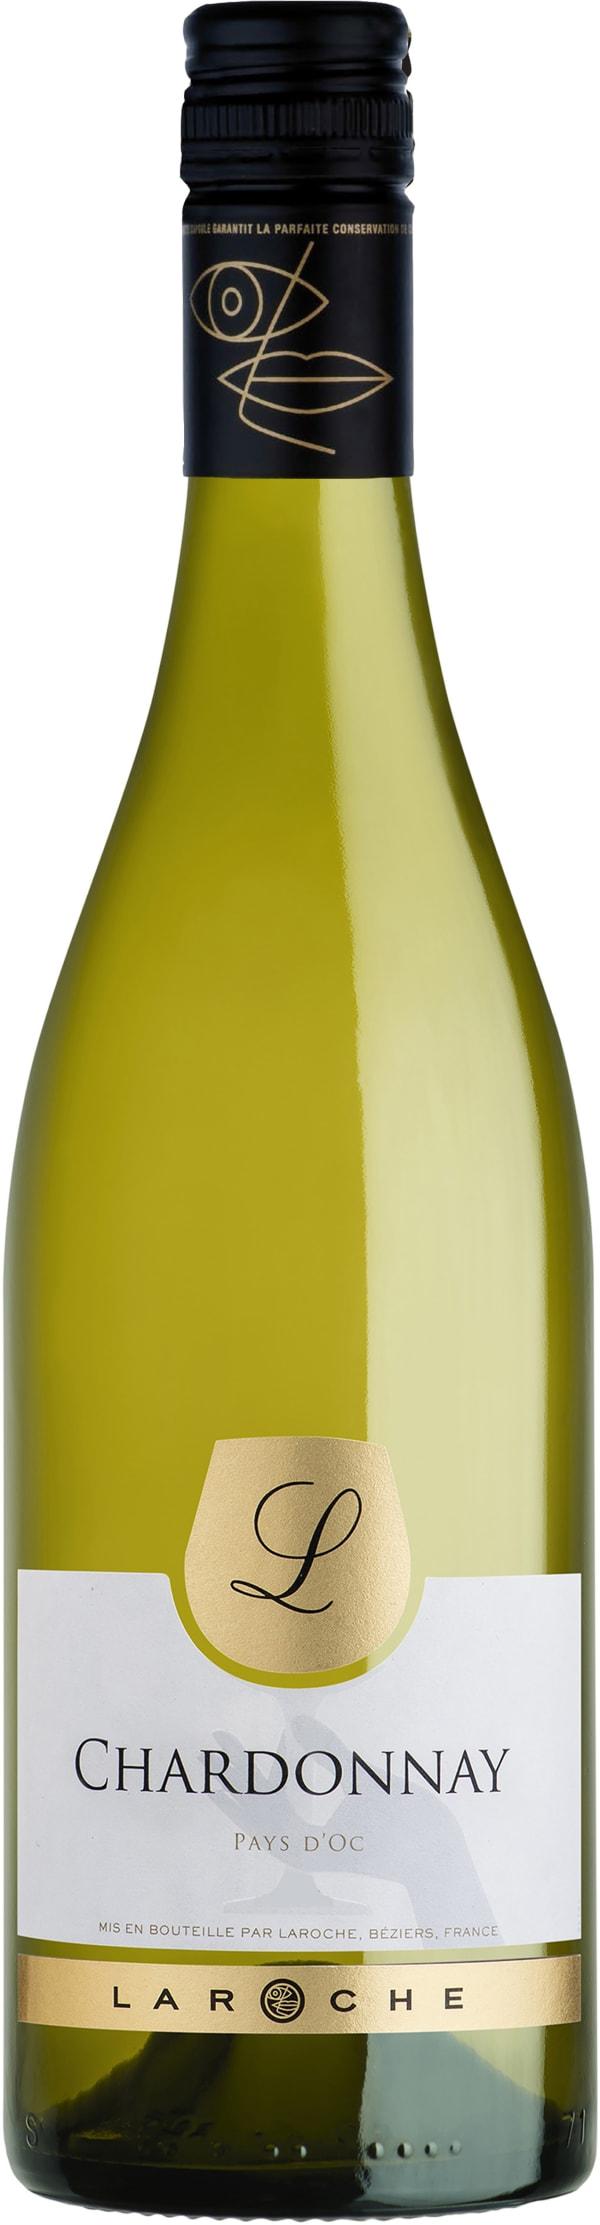 Laroche Chardonnay L 2016